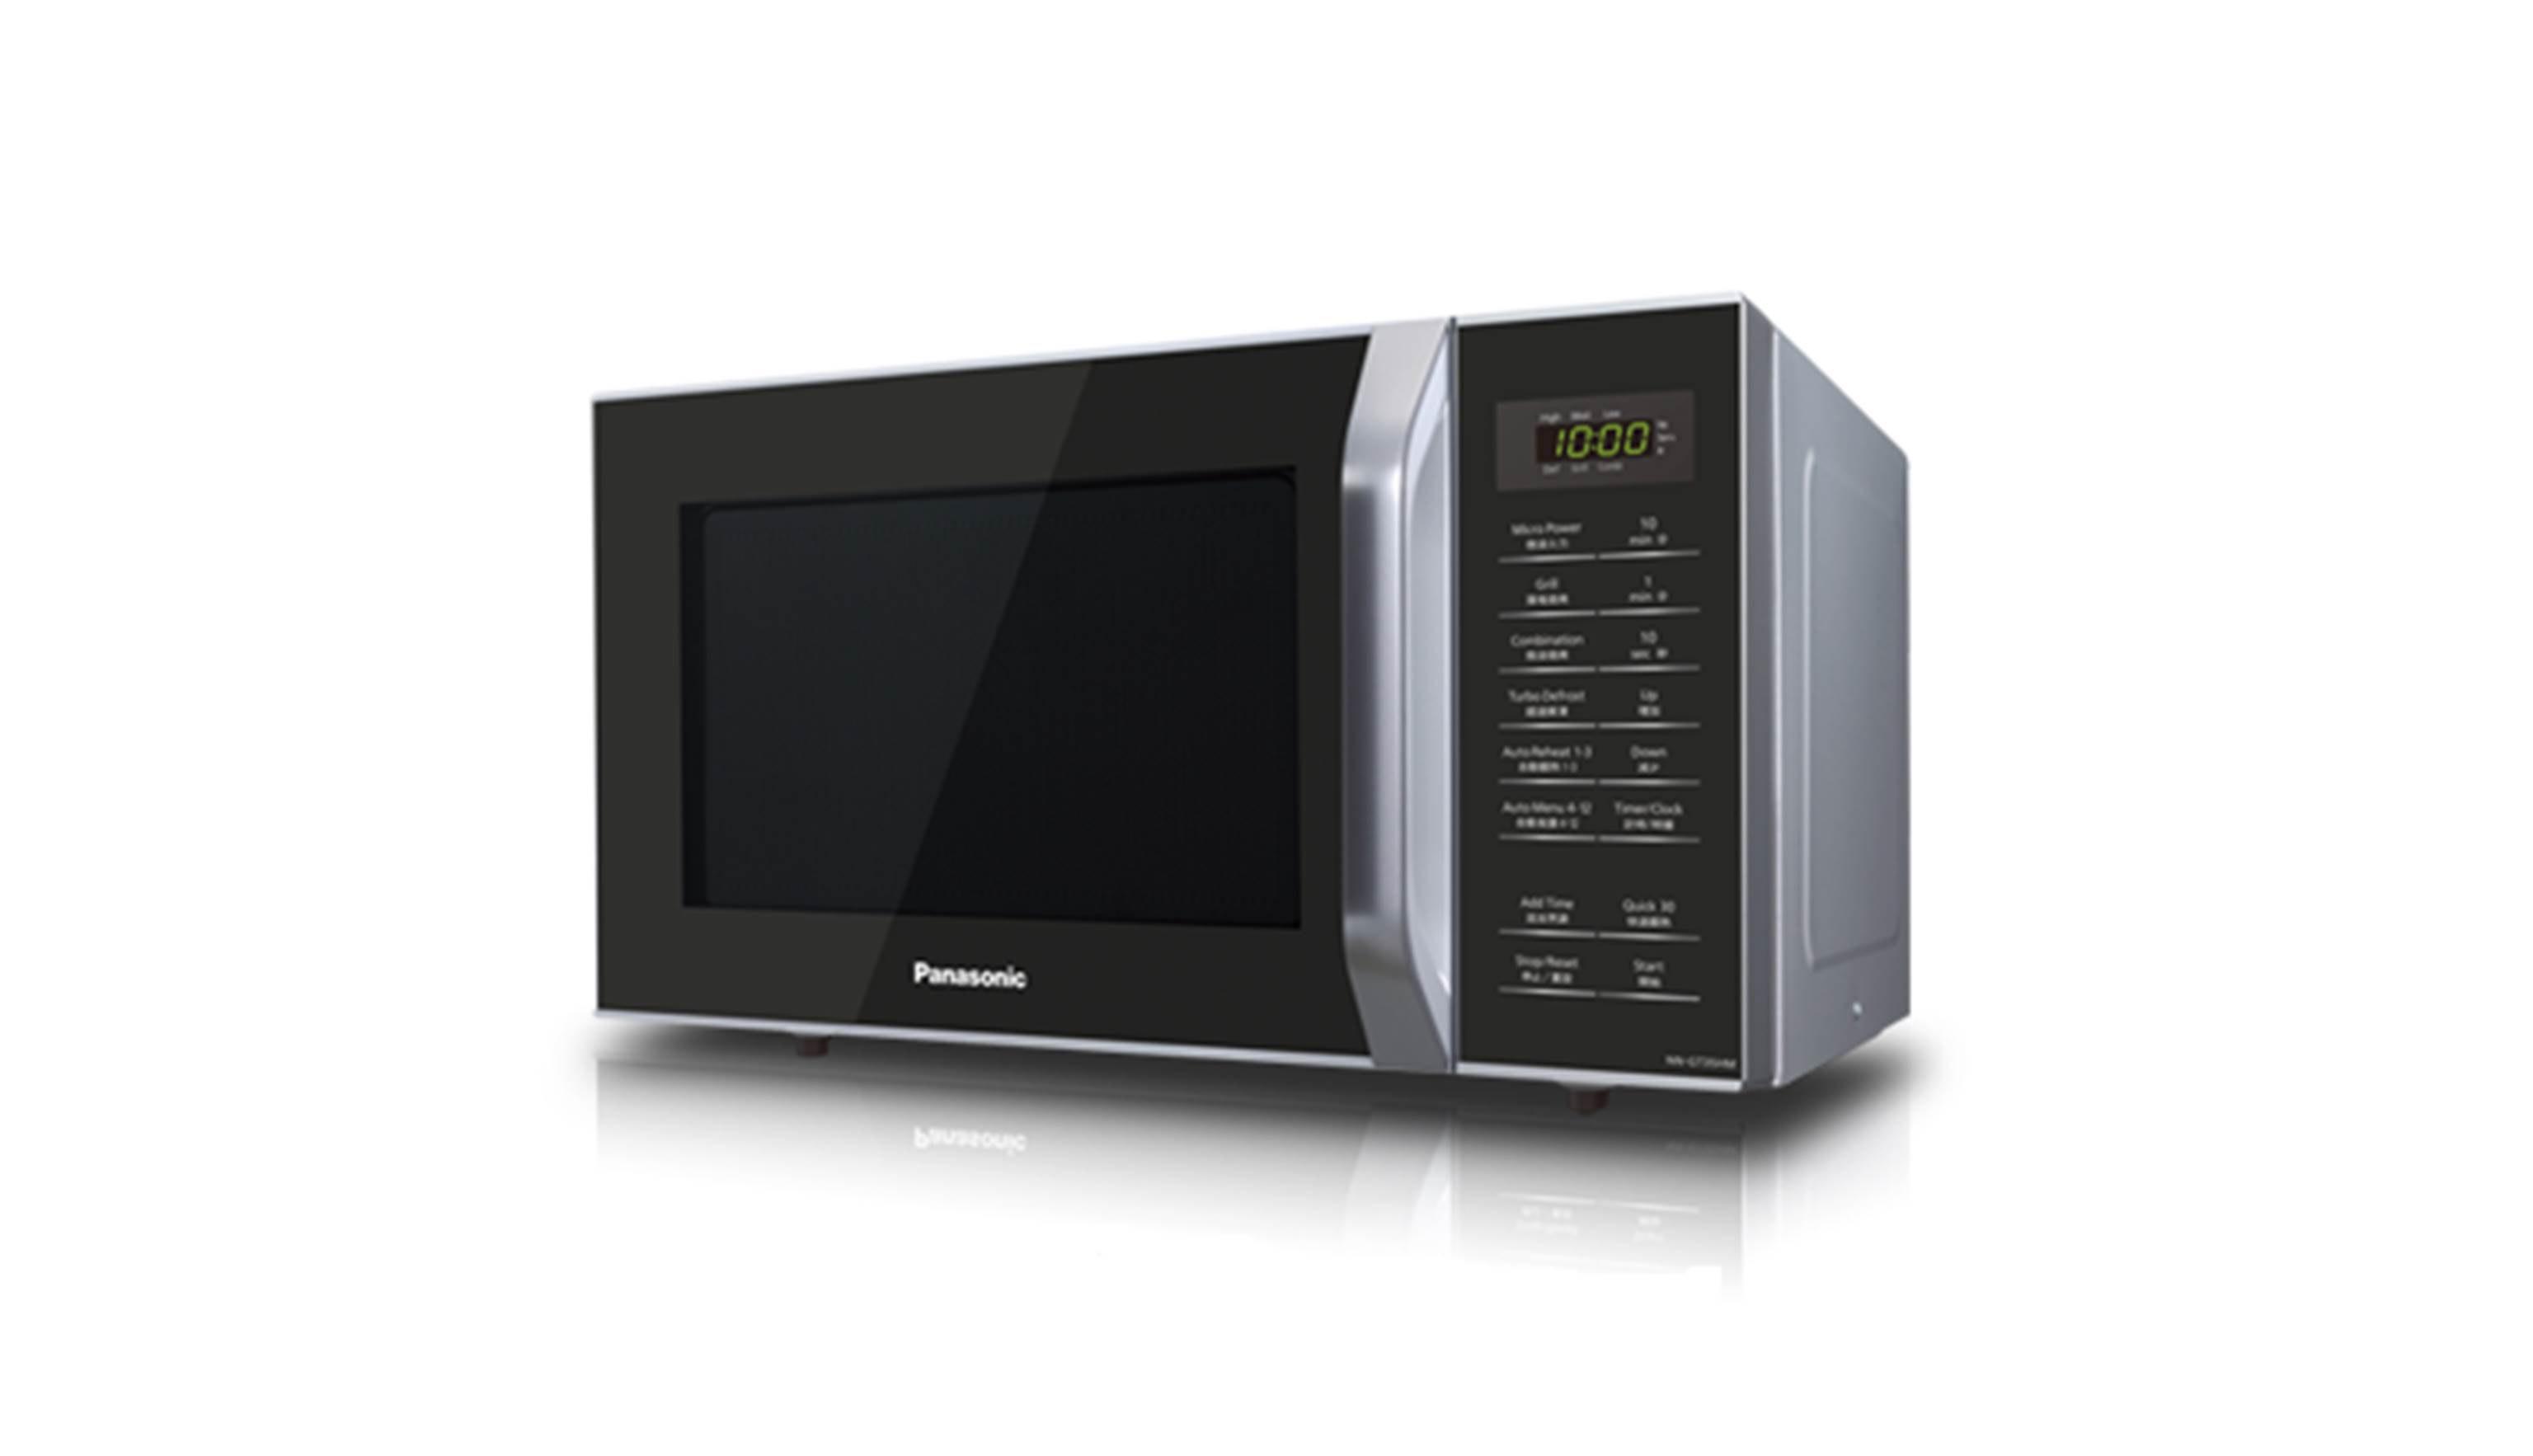 Panasonic NN-GT35HMYPQ Microwave Oven